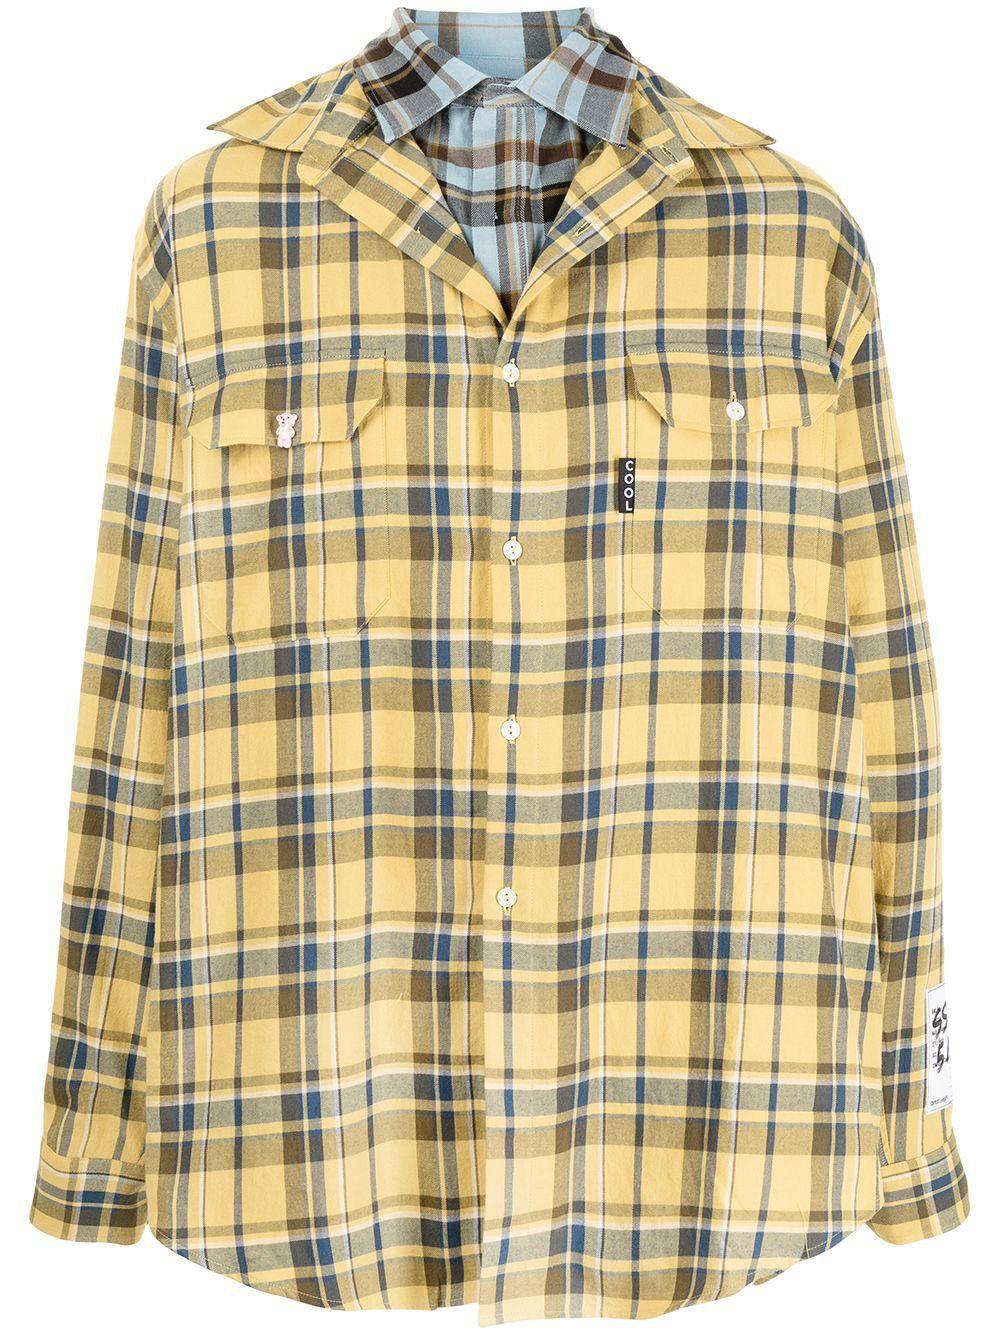 Oversized Reversible Shirt